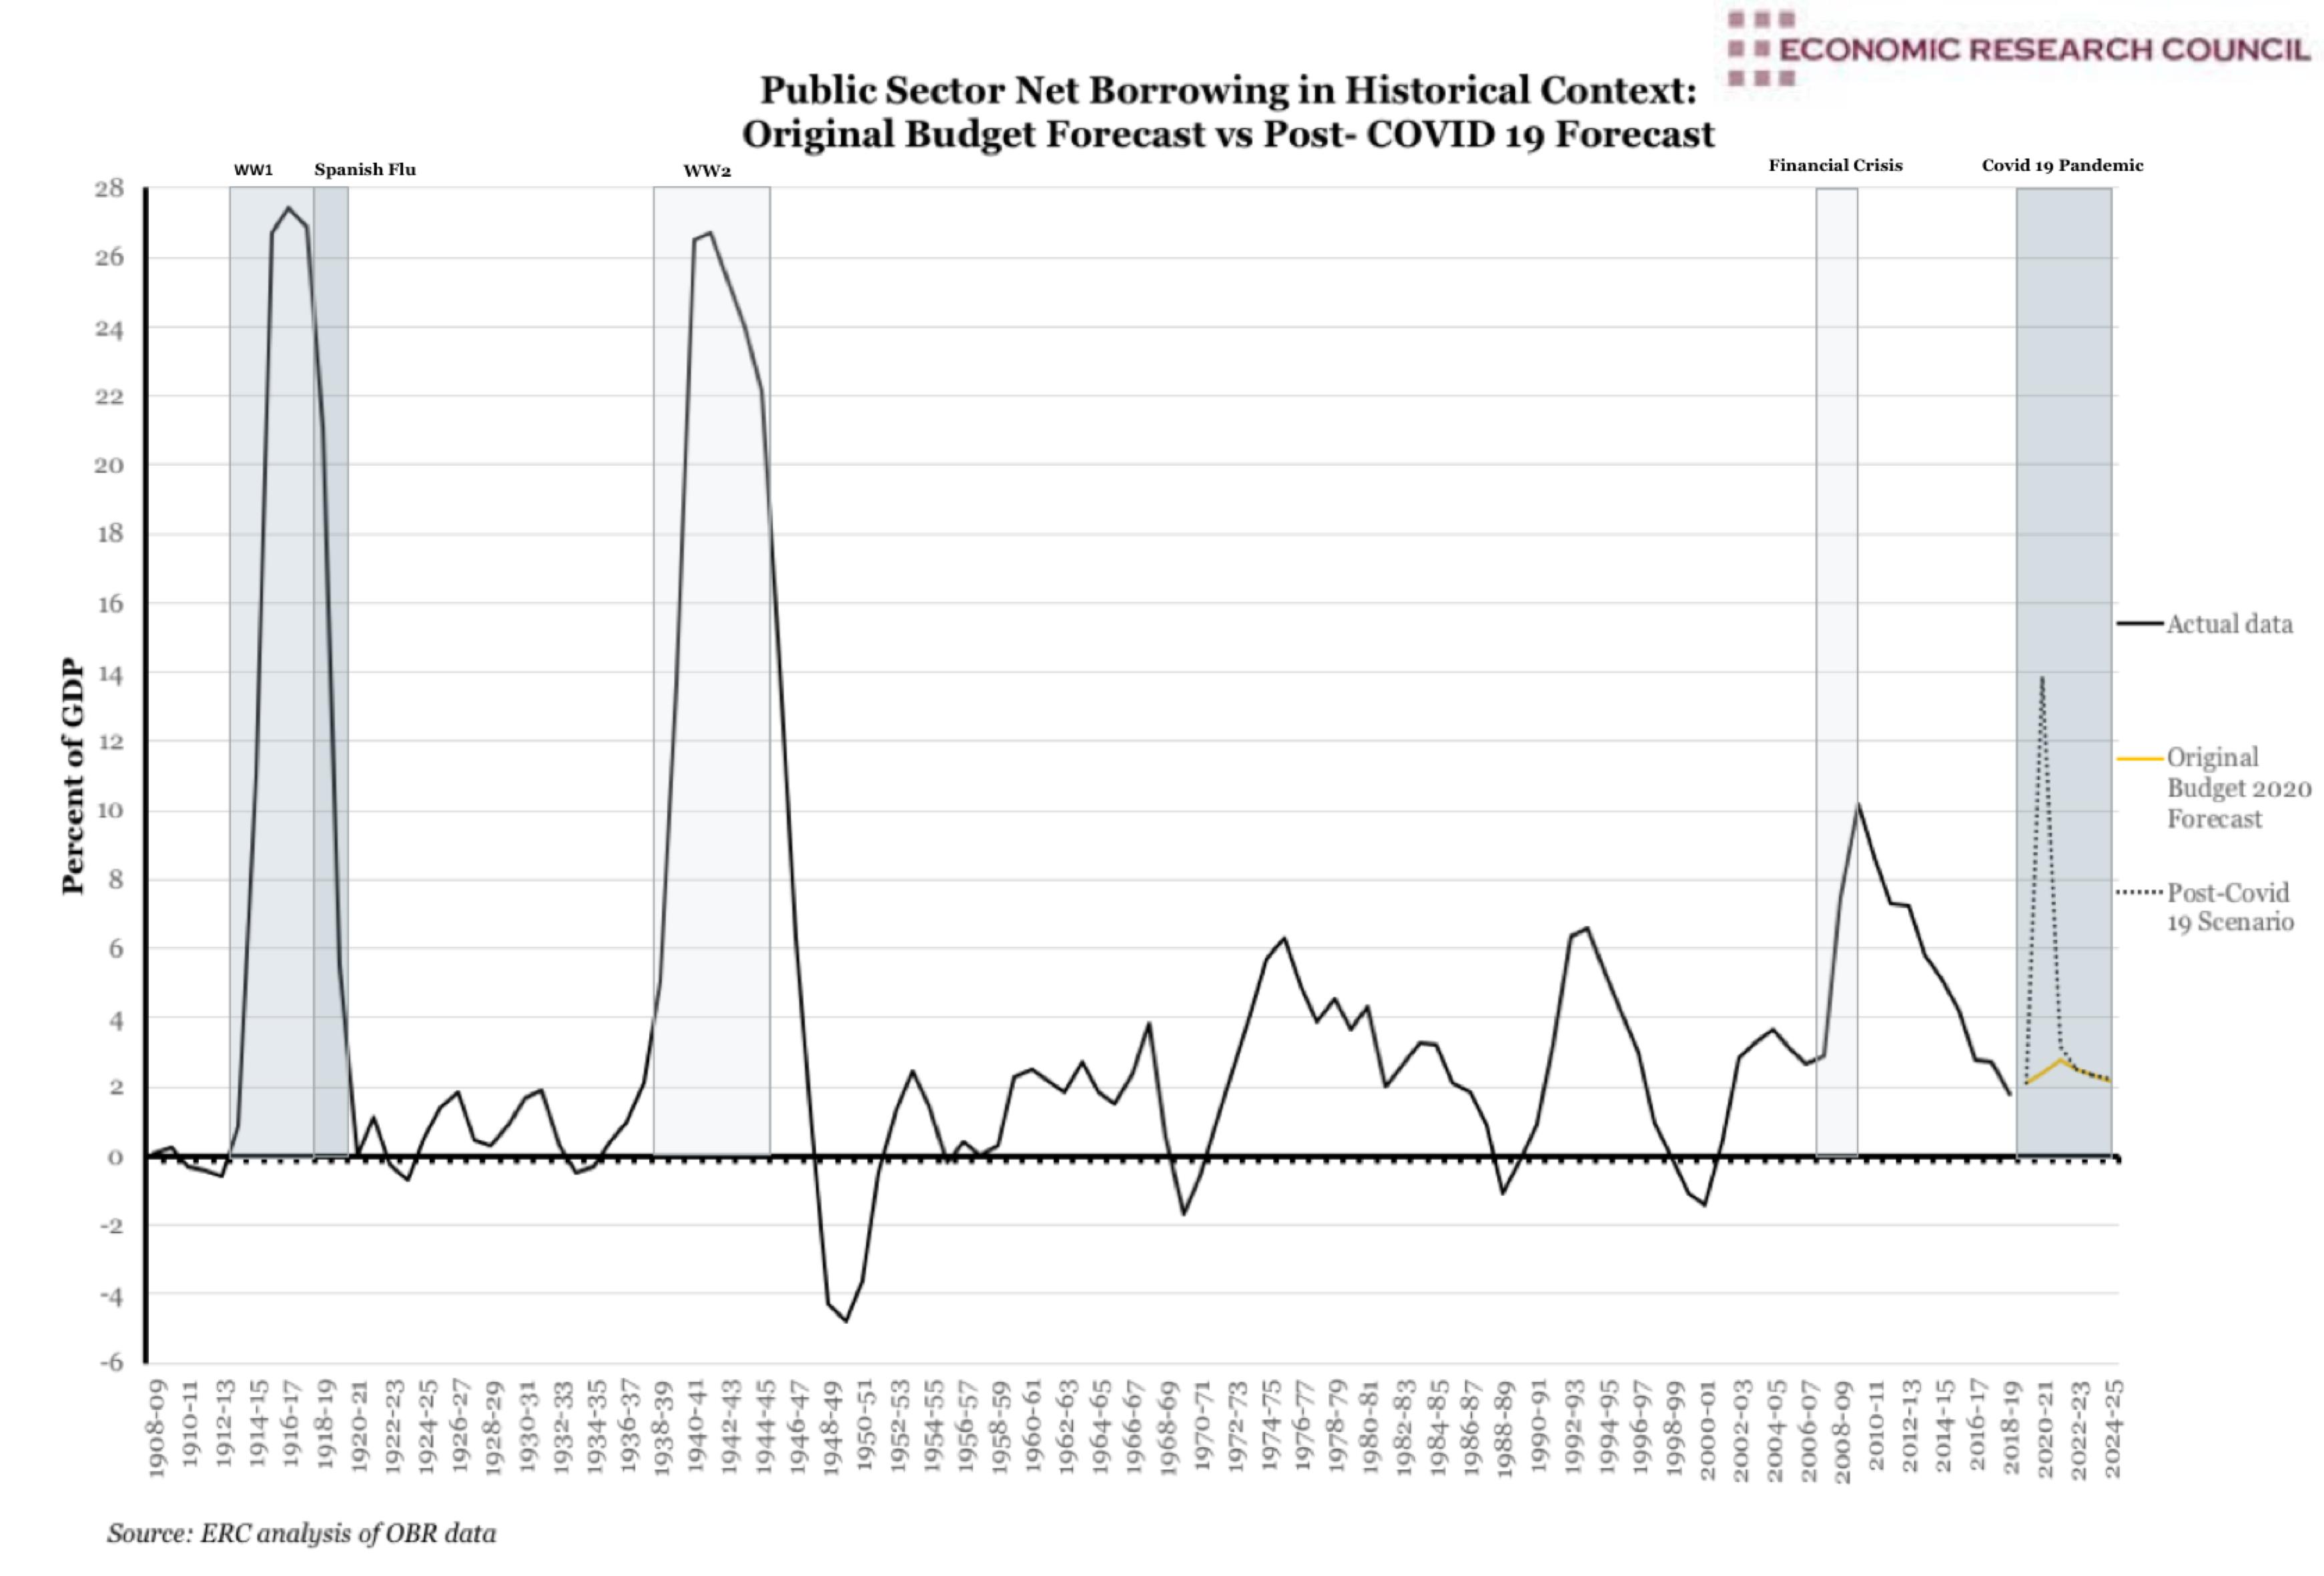 Historical Public Sector Net Borrowing